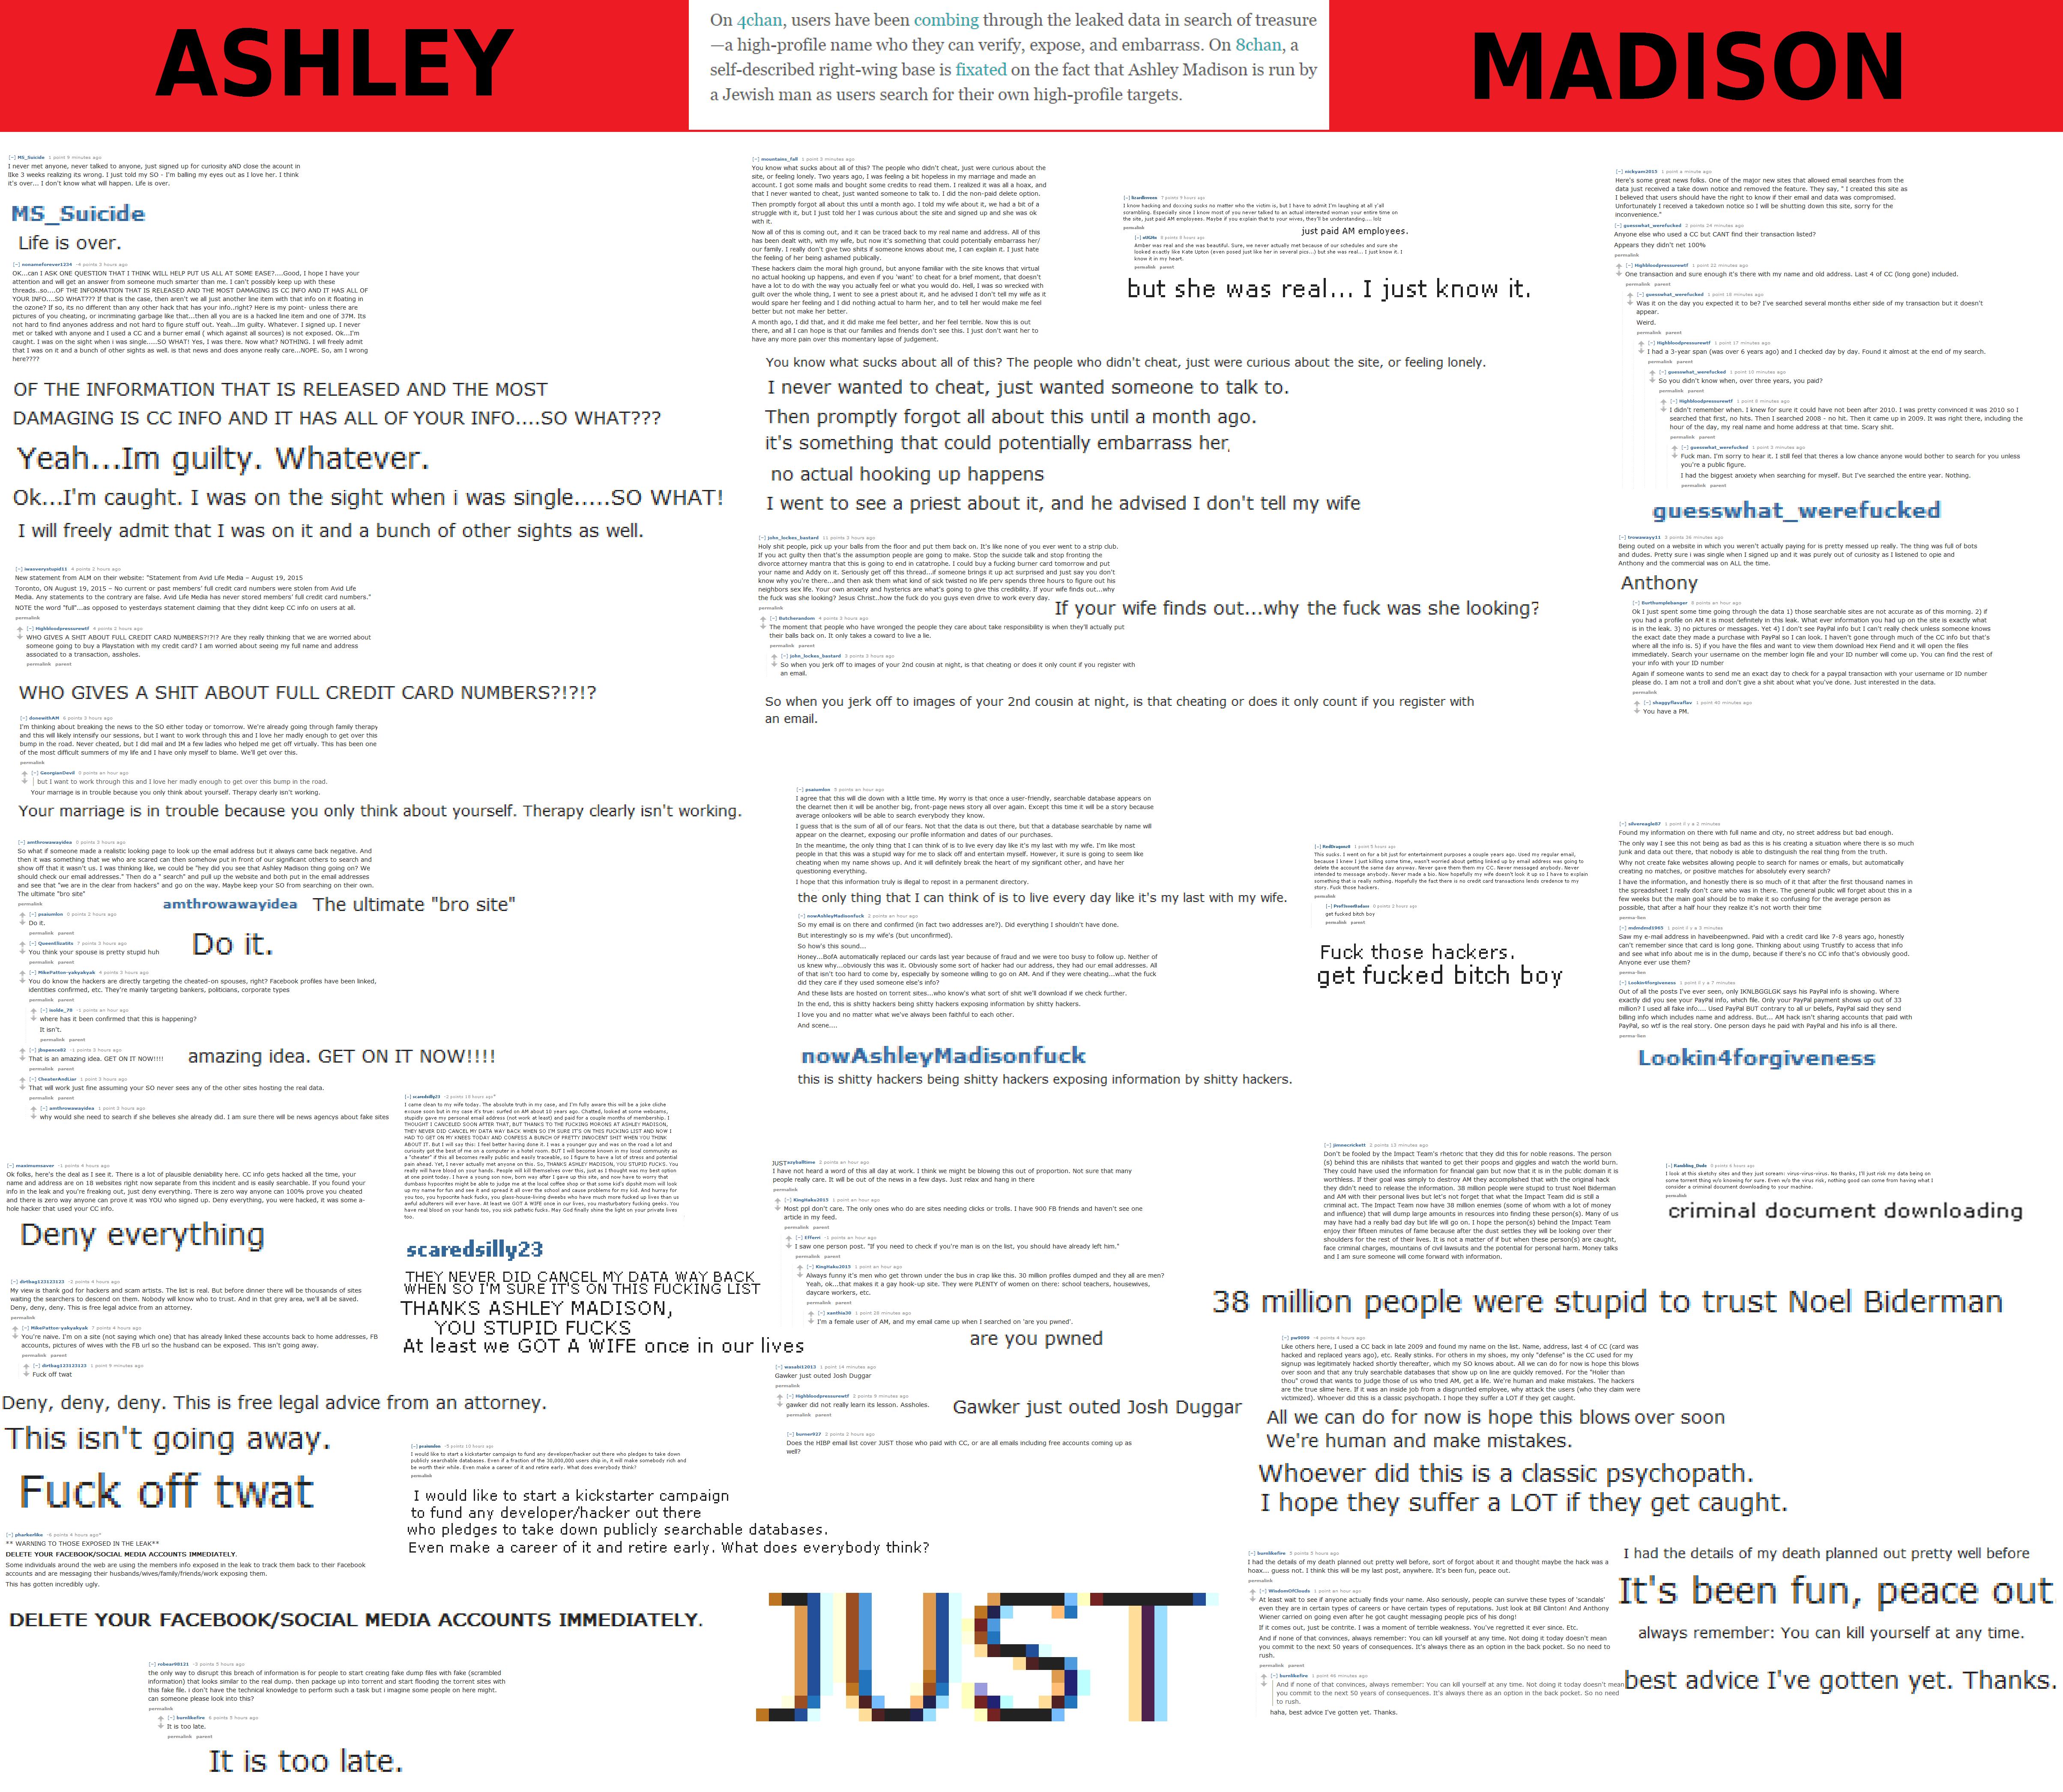 ashley madison cheaters make burner accounts on plebbit and calmly